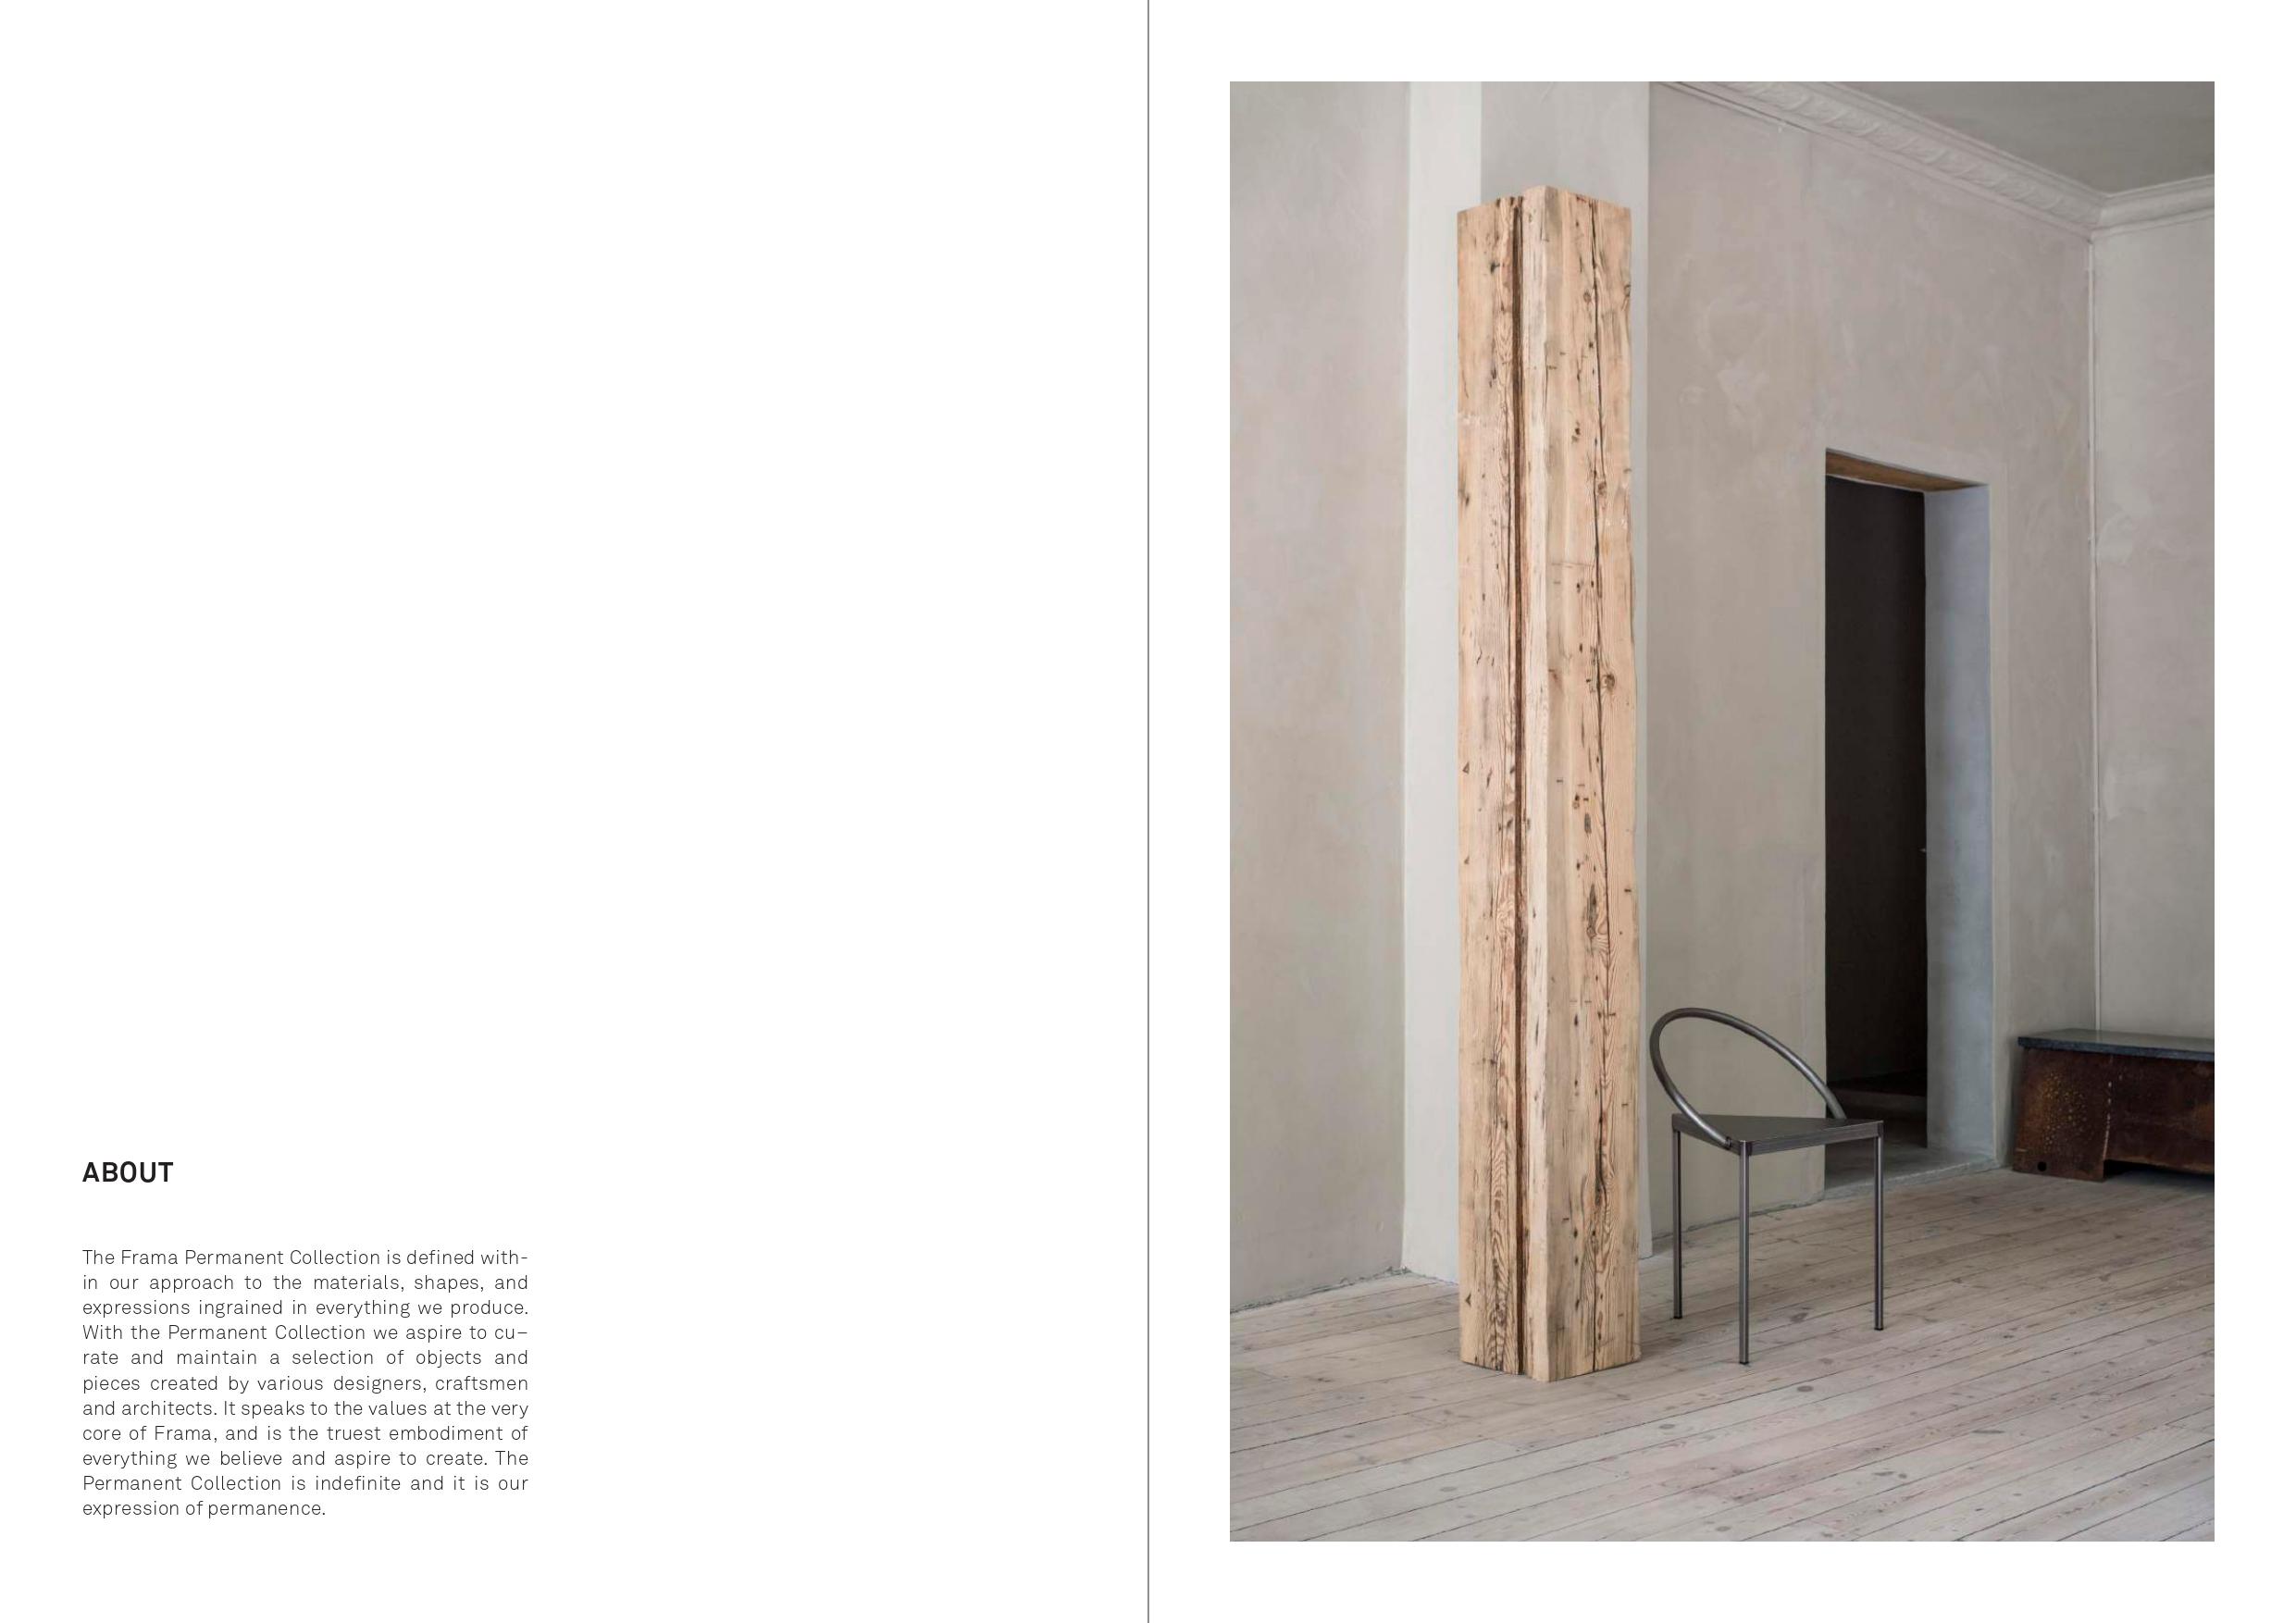 Frama l 2019 l general catalogue_page-0002.jpg